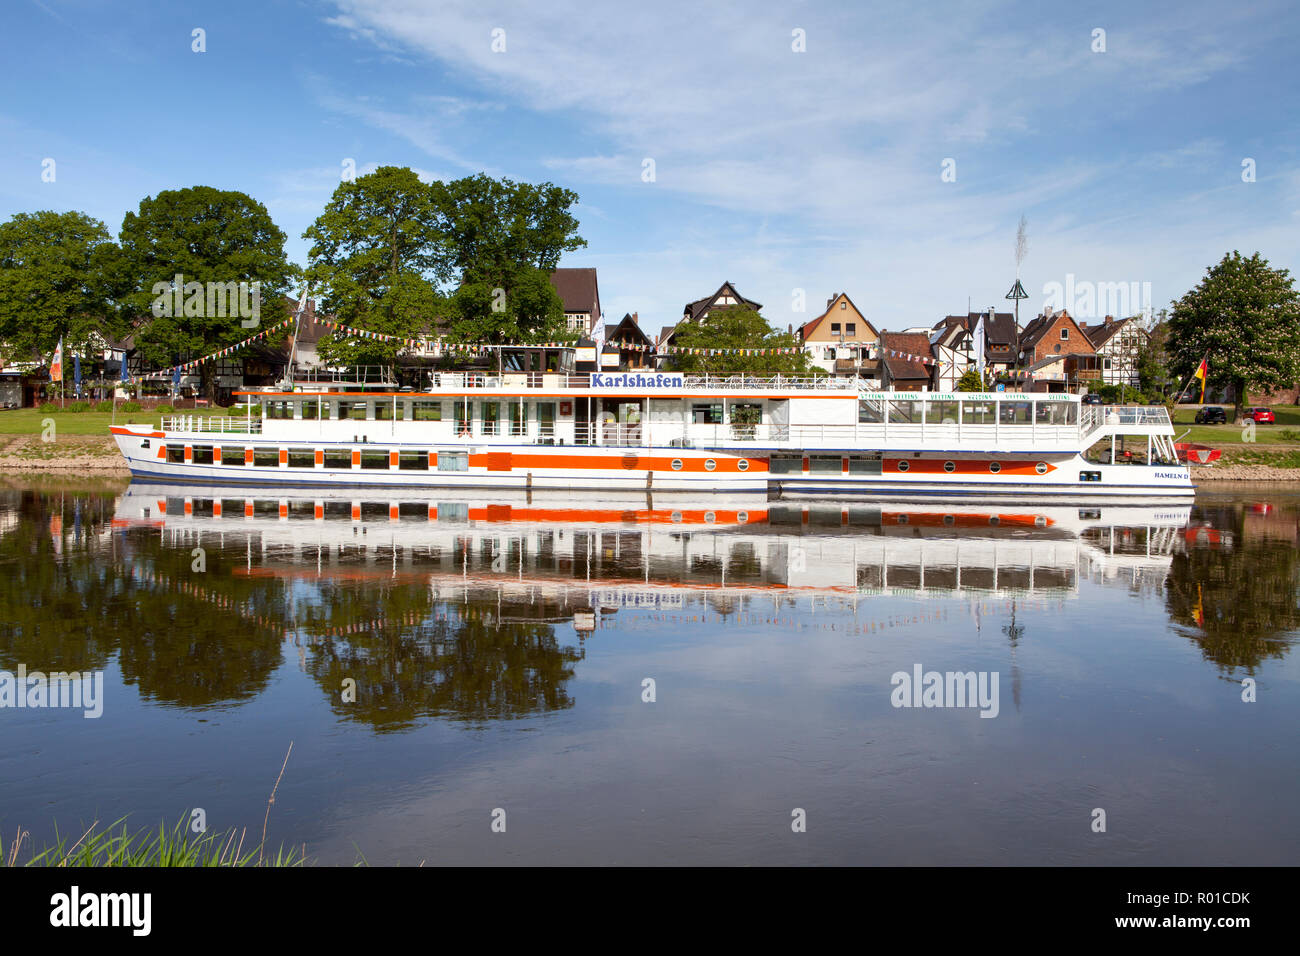 Barco de pasajeros Karlshafen, Bodenwerder, cuna del Barón Muenchhausen, Weserbergland, Baja Sajonia, Alemania, Europa Foto de stock